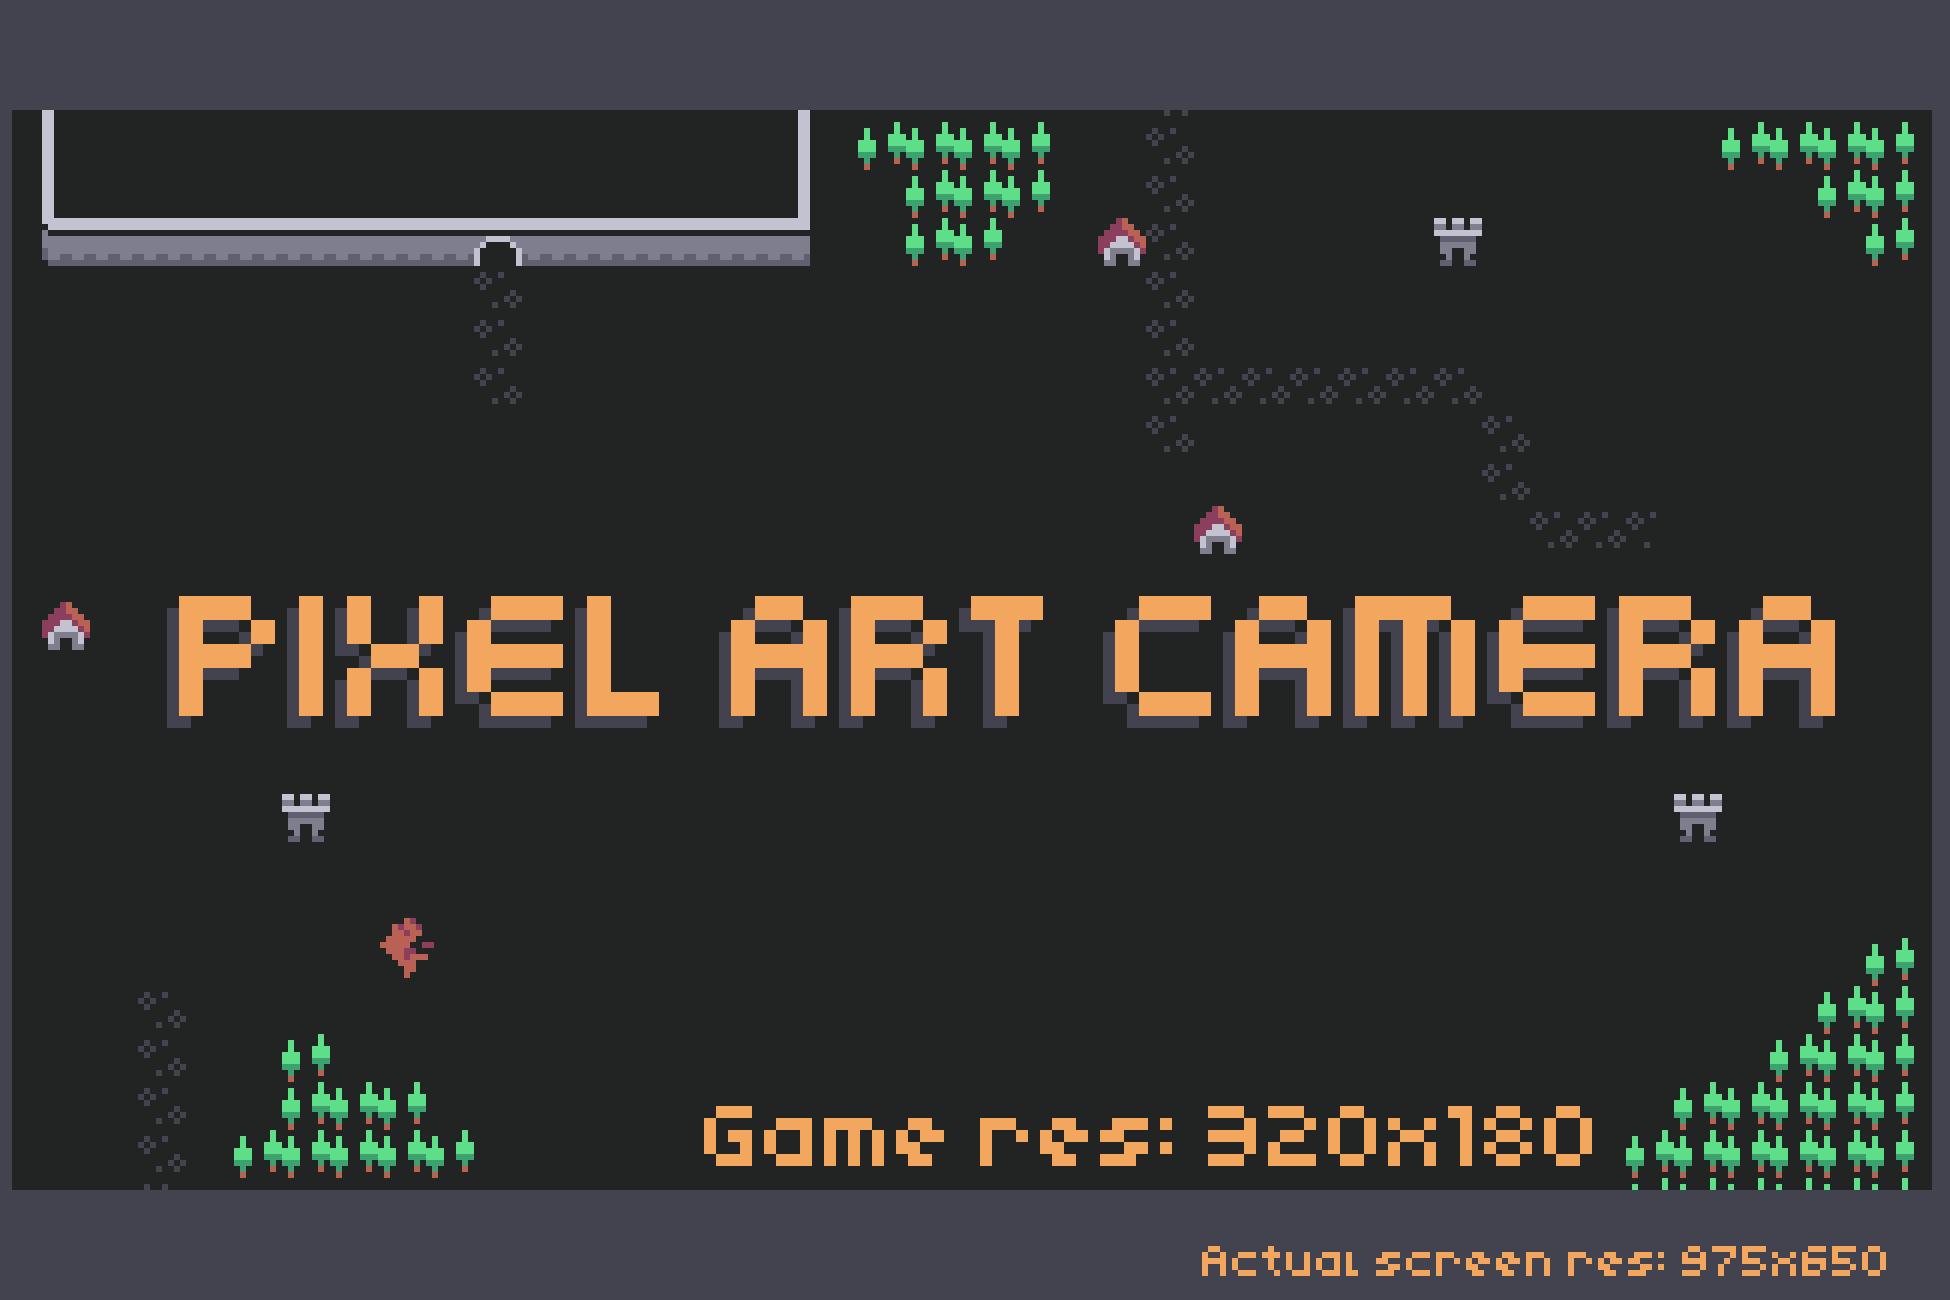 PixelArtCamera